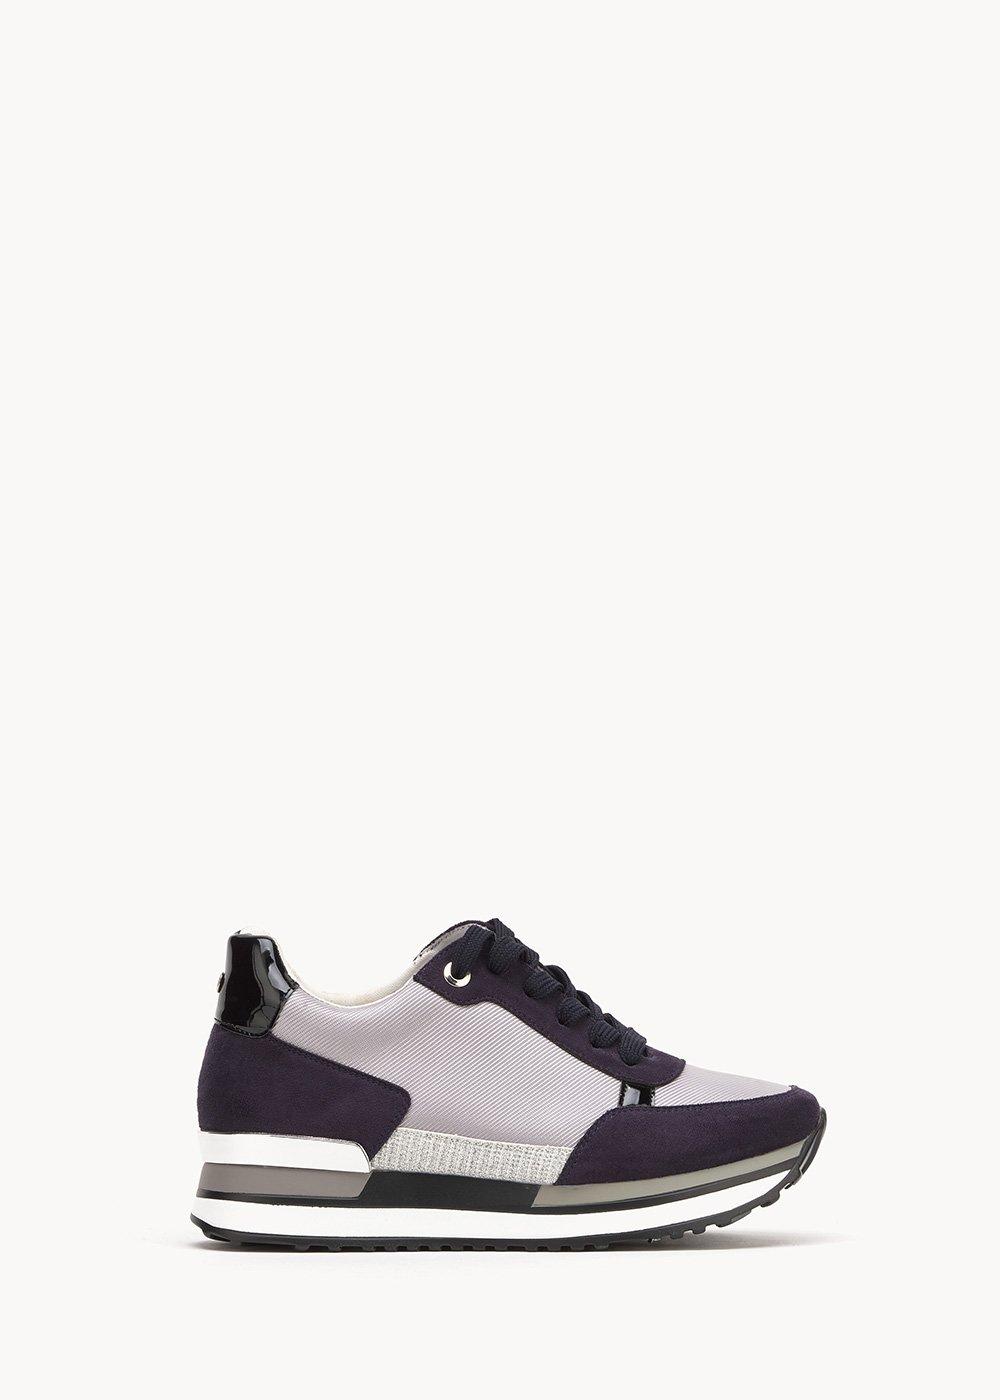 Soel sneakers in technical fabric - Marina / Silver - Woman